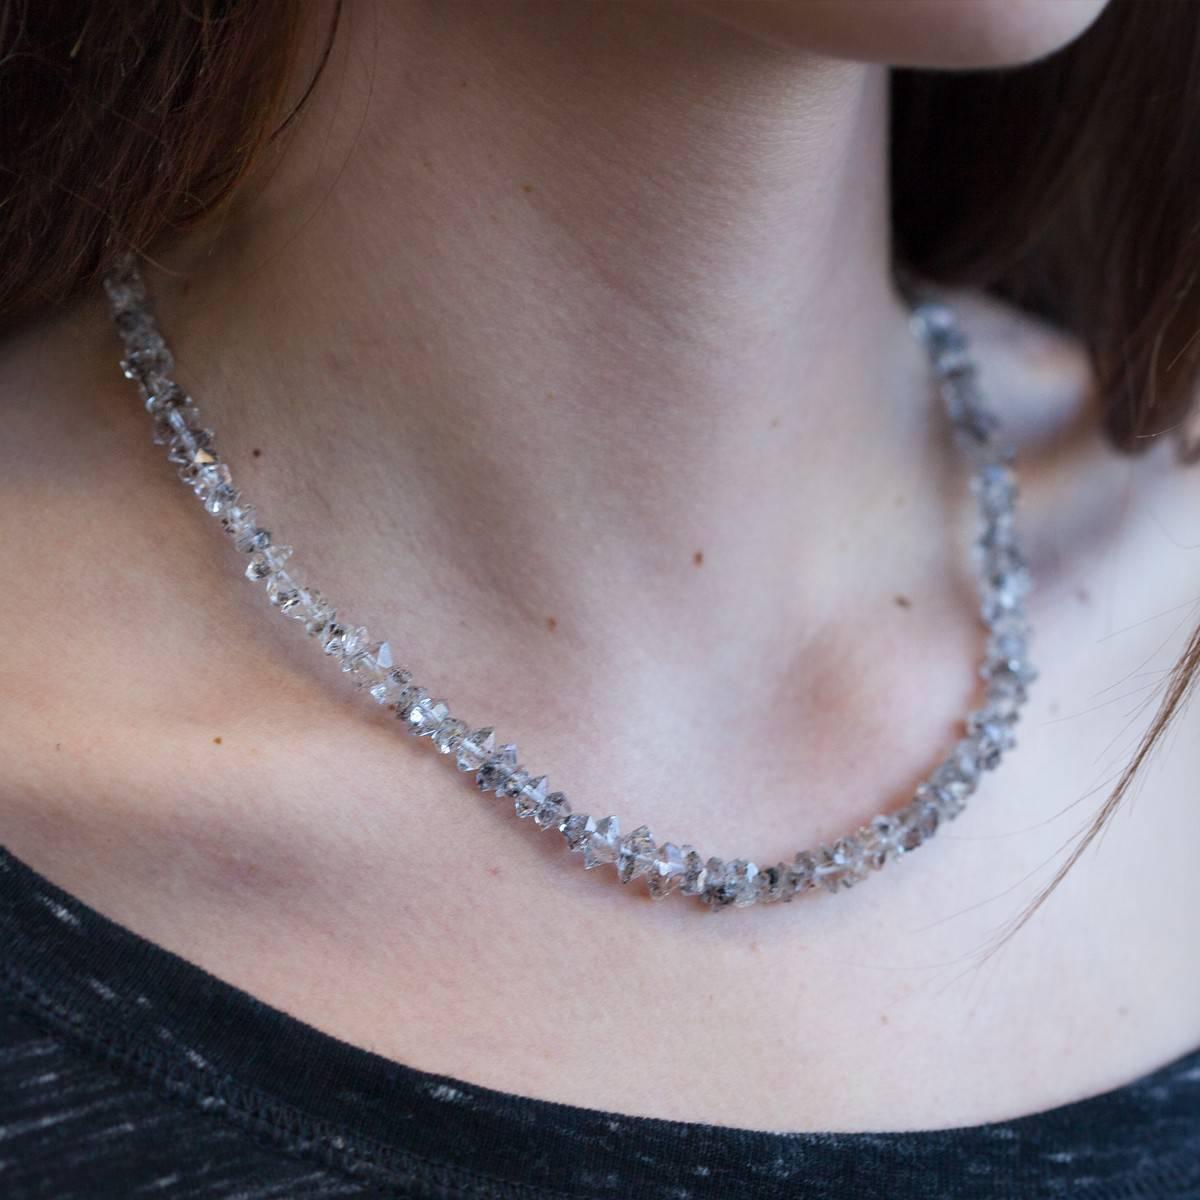 Healing Herkimer Diamond Necklaces 4_20 Primary